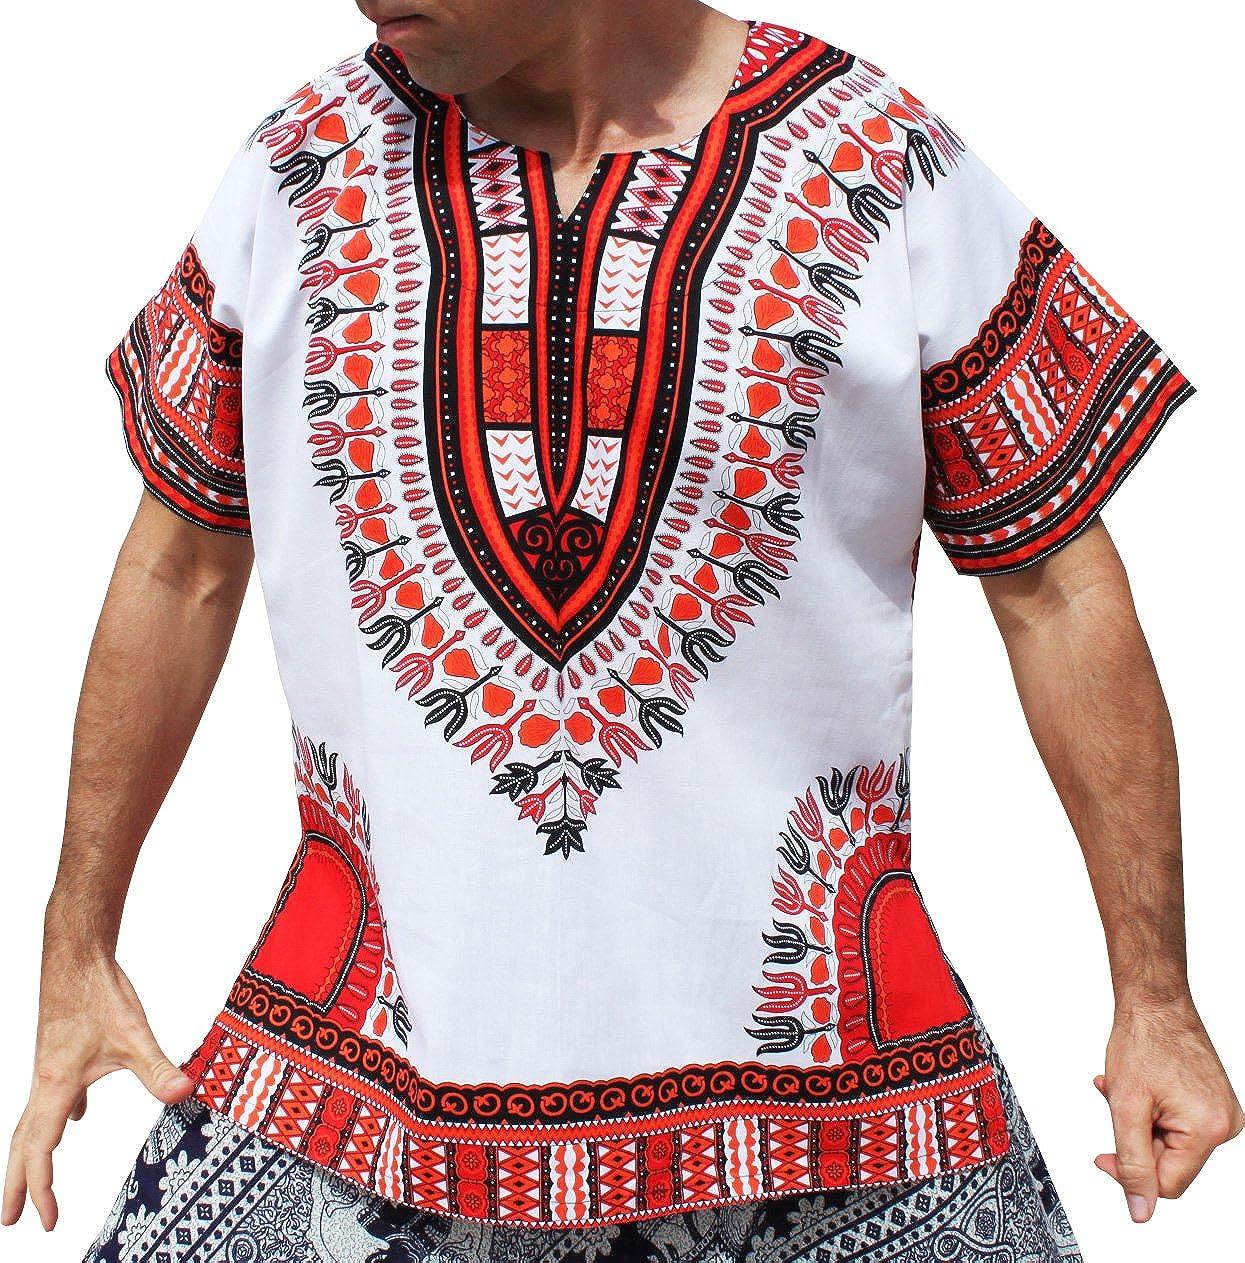 Raan Pah Muang Brand Unisex Bright White Cotton Africa Dashiki Shirt Plain Front CA_AMZvariant20830MDL